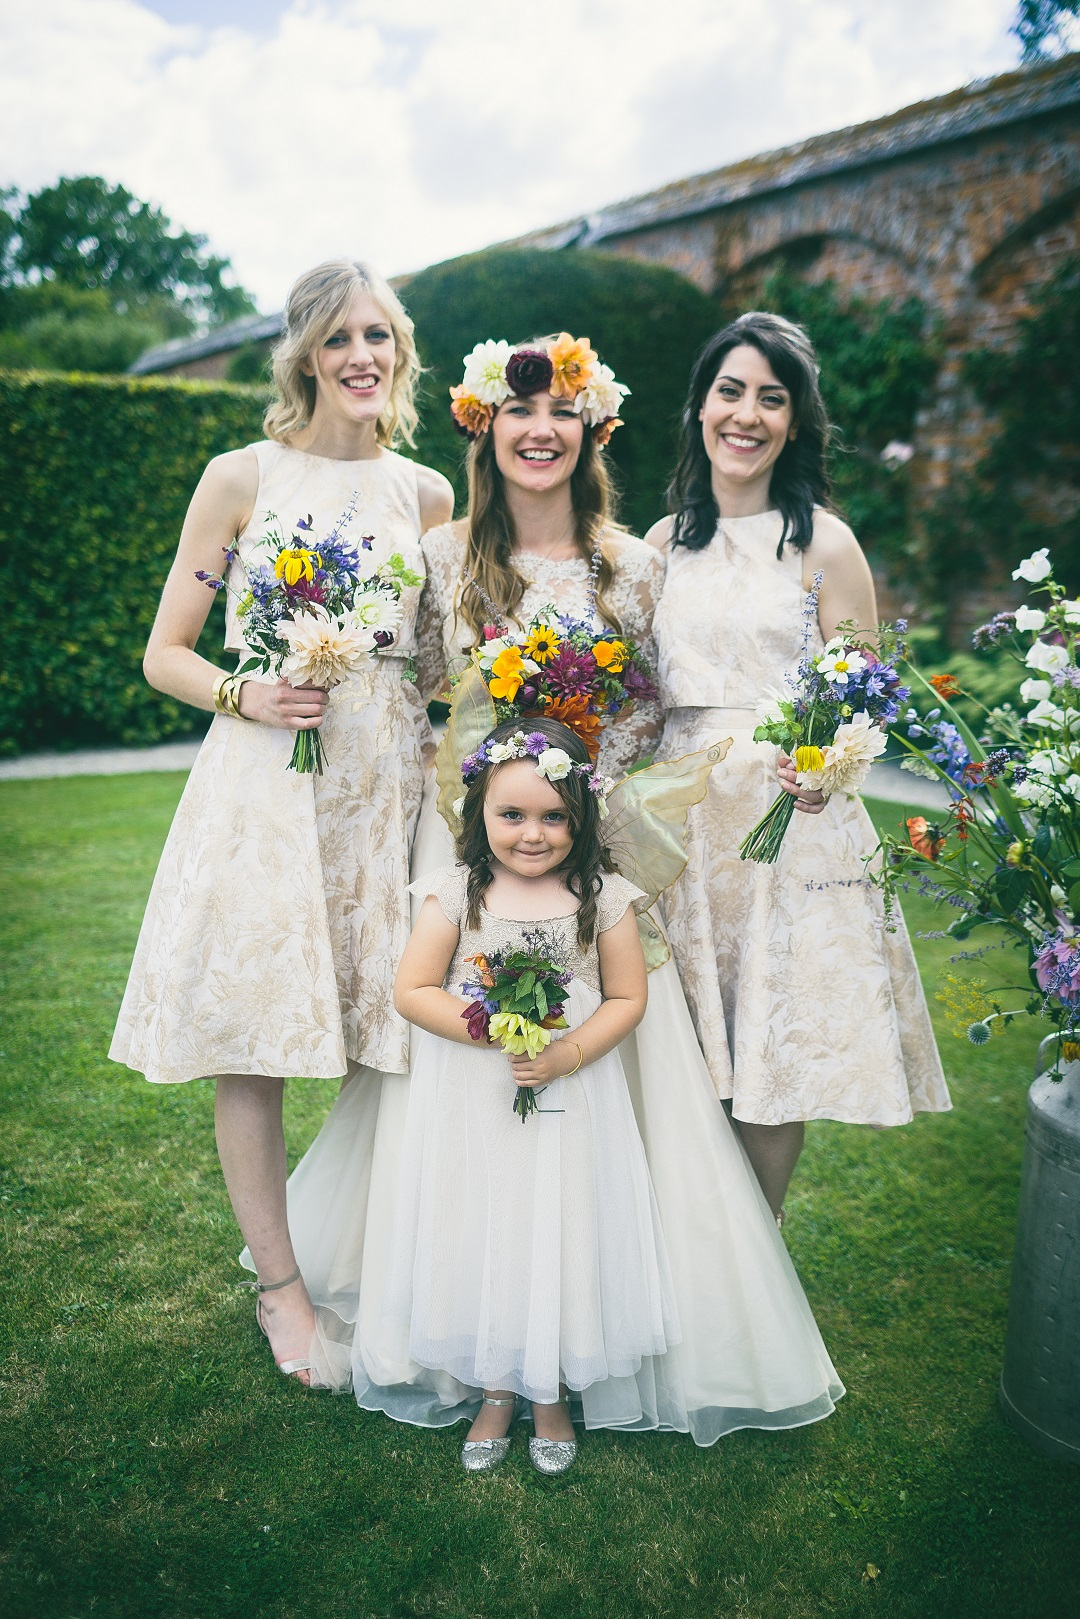 157-Portraits - Sarah, flowergirl & bridesmaids